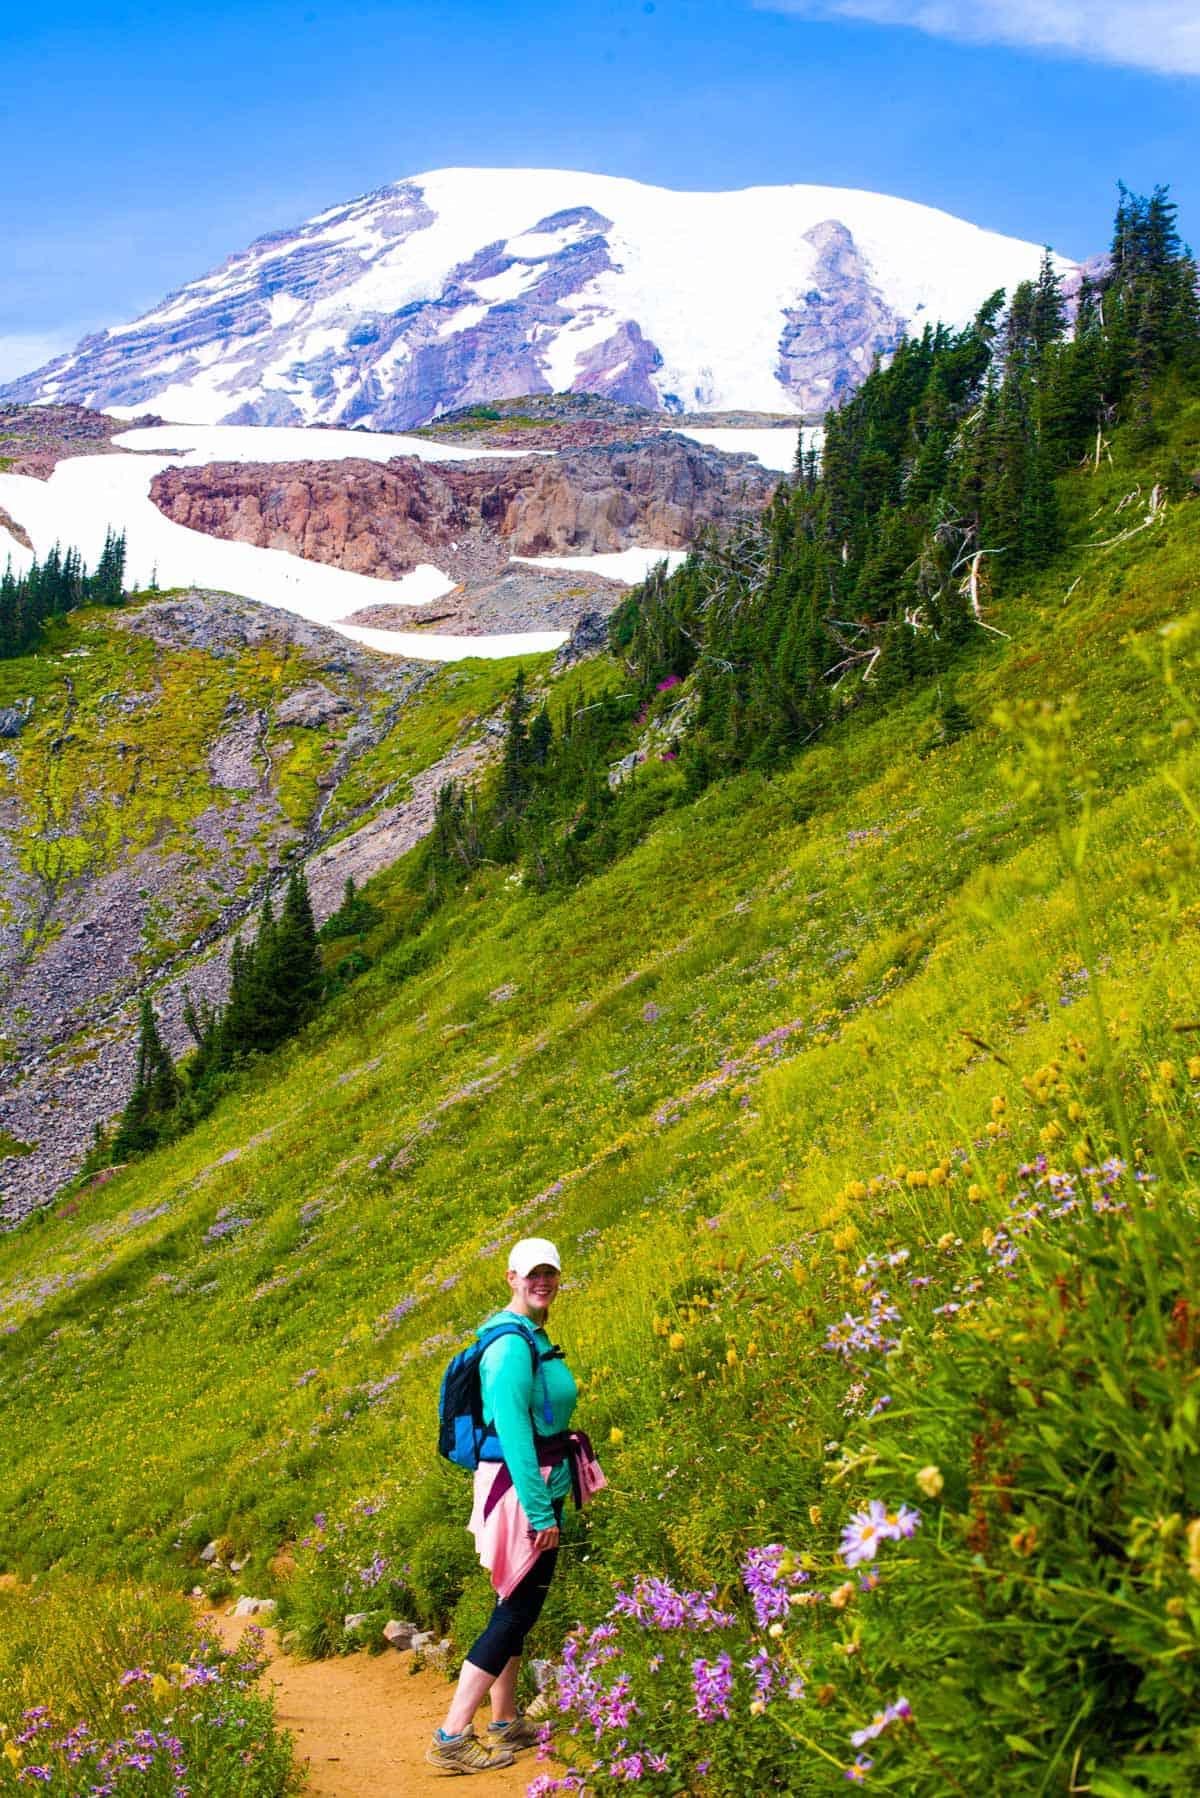 On the way down -- Skyline Trail, Mount Rainier